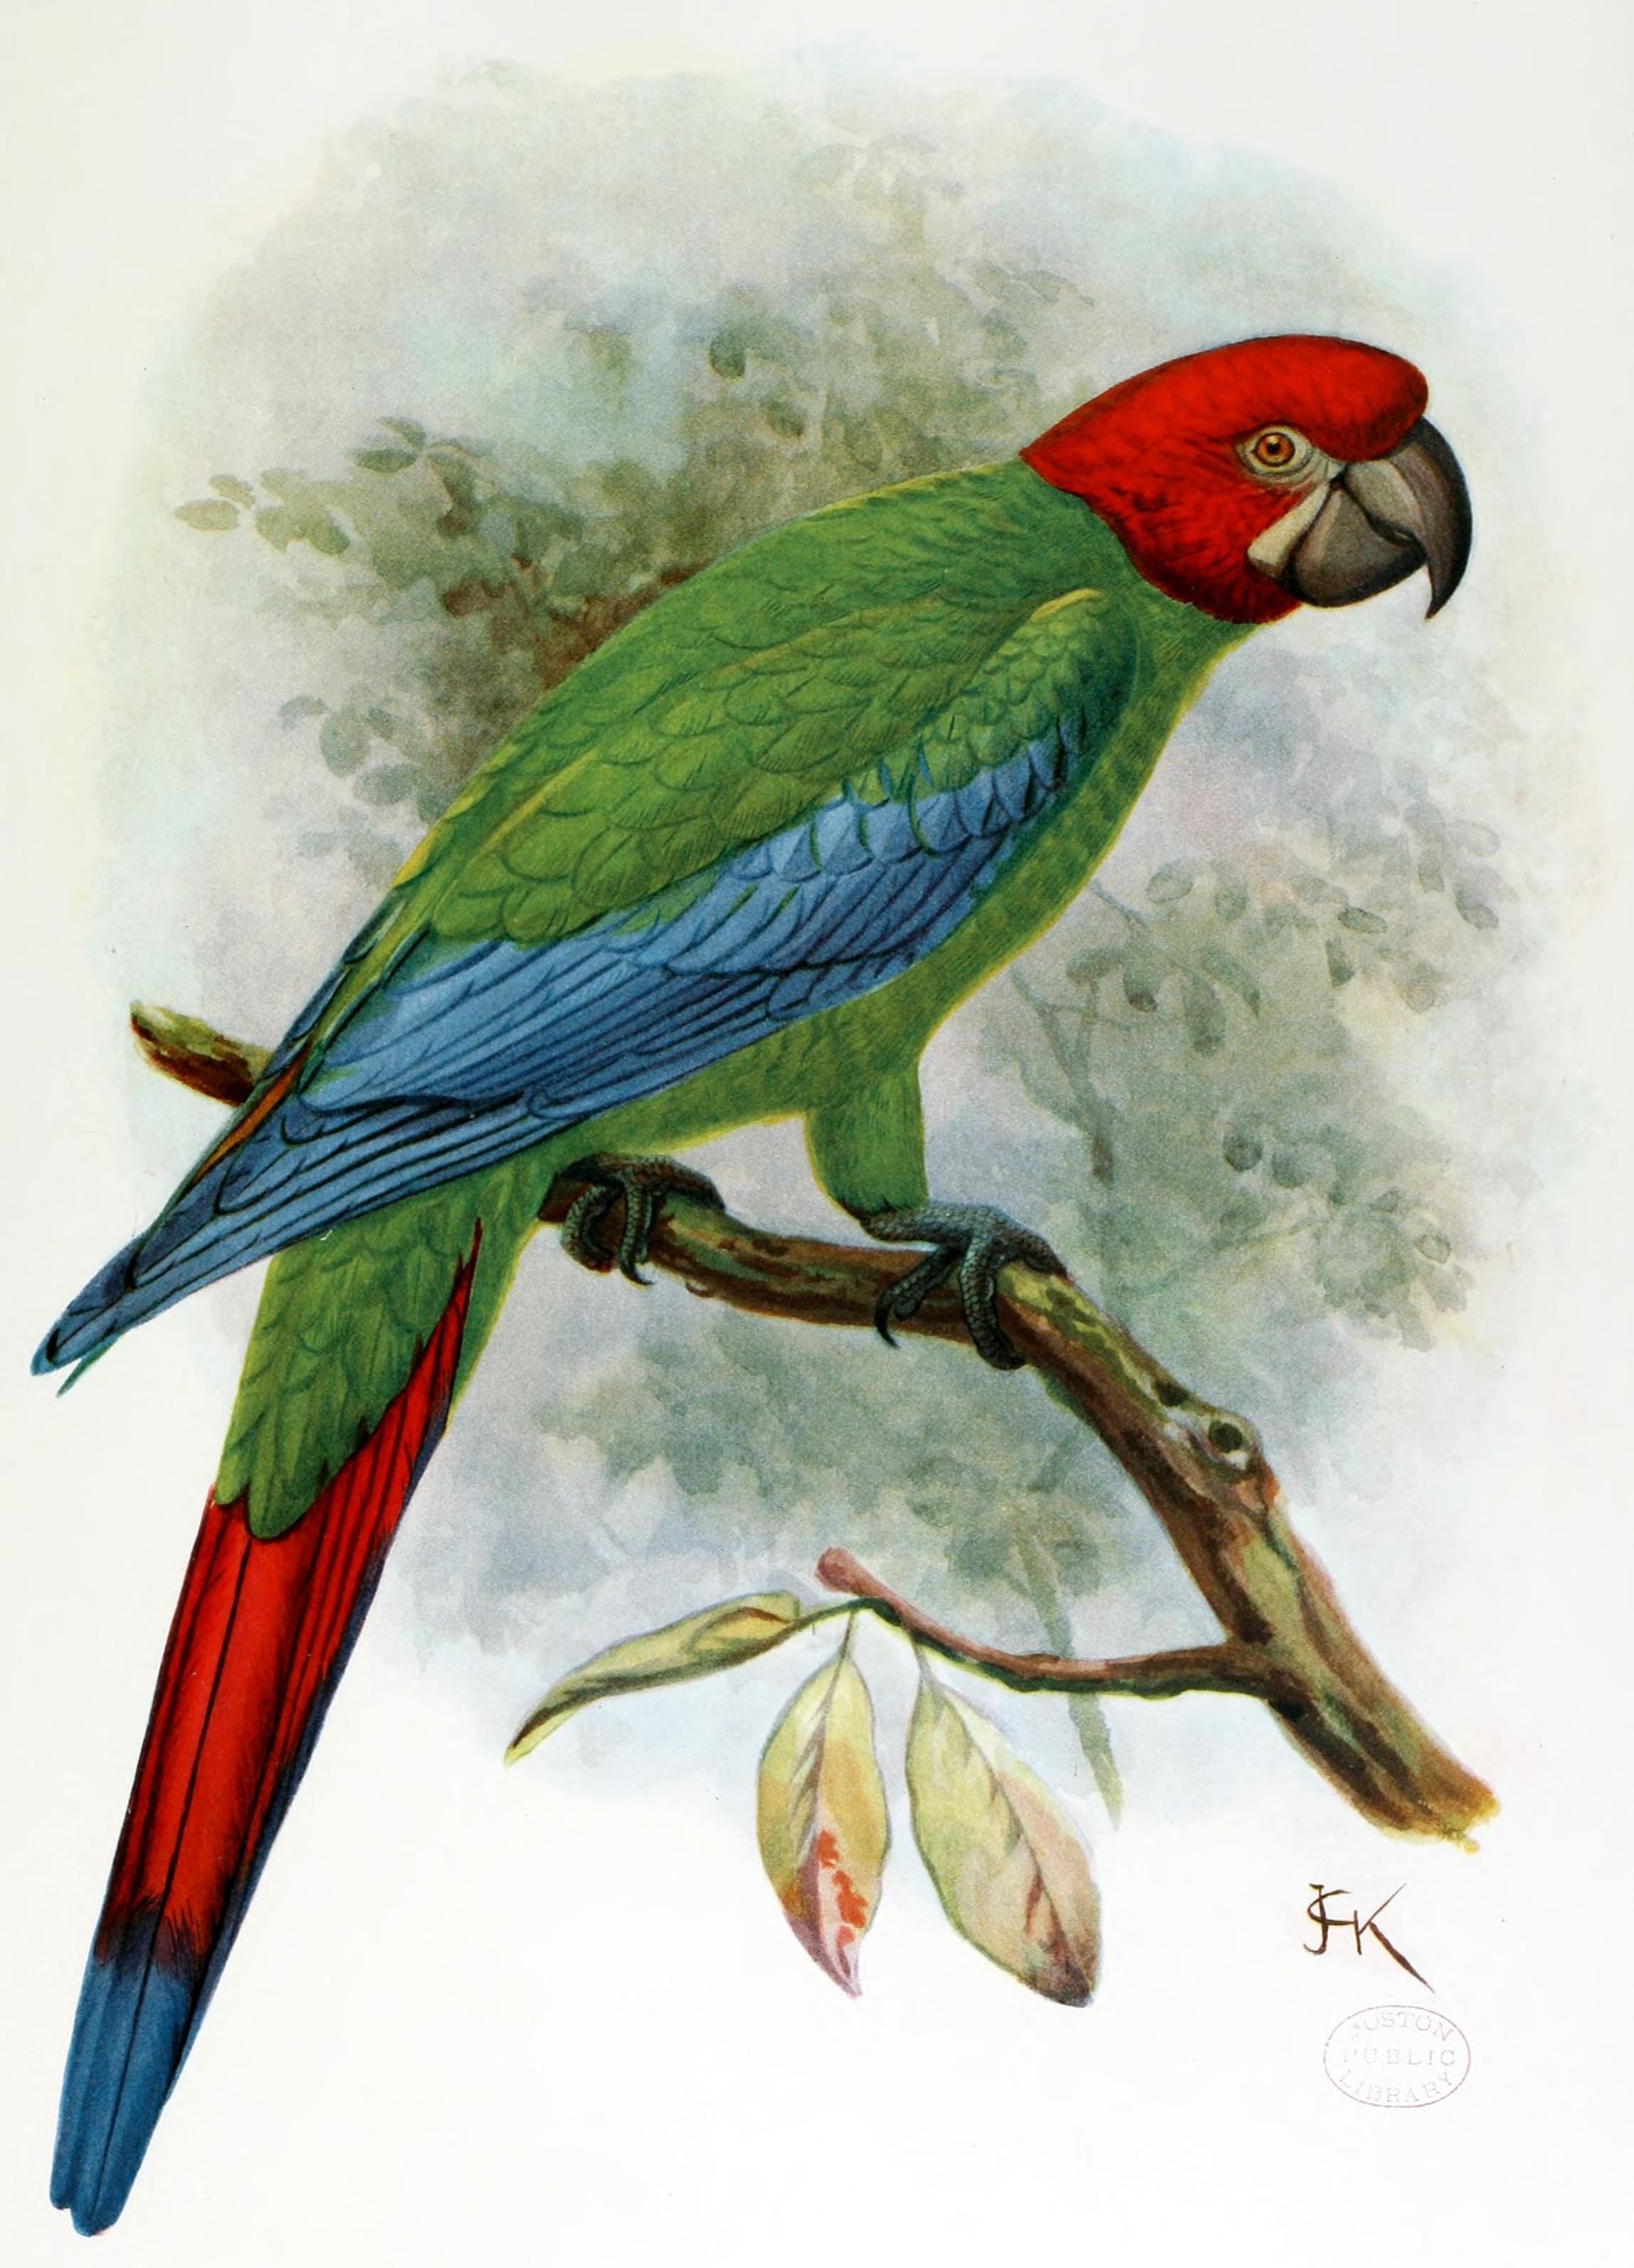 Ara erythrocephala Gosse, 1847.